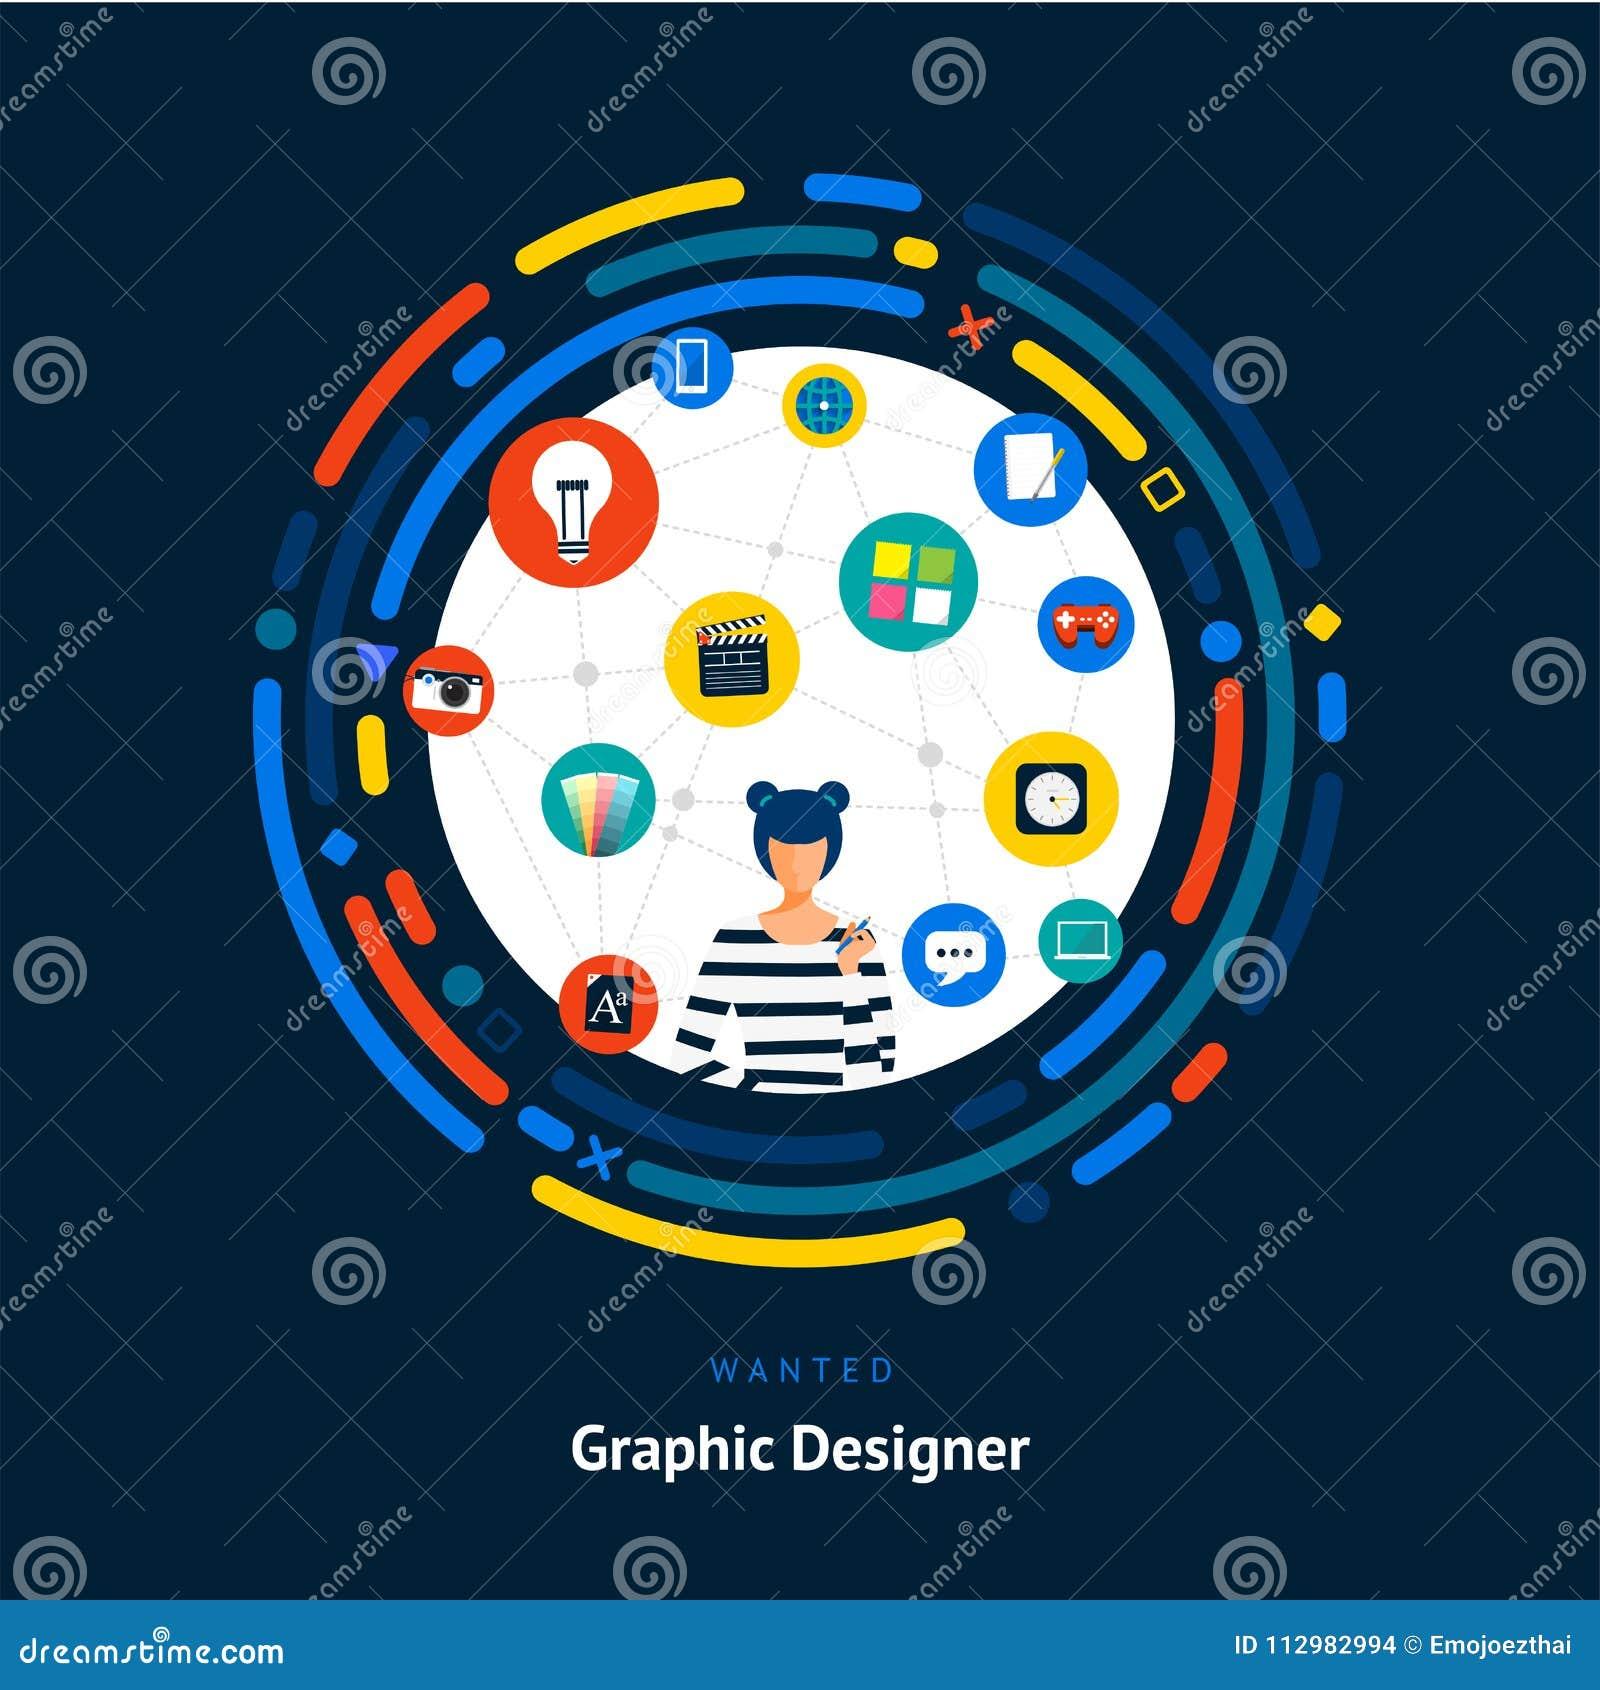 Vector illustrate flat design concept creative director. creative idea skill for get job or success people.